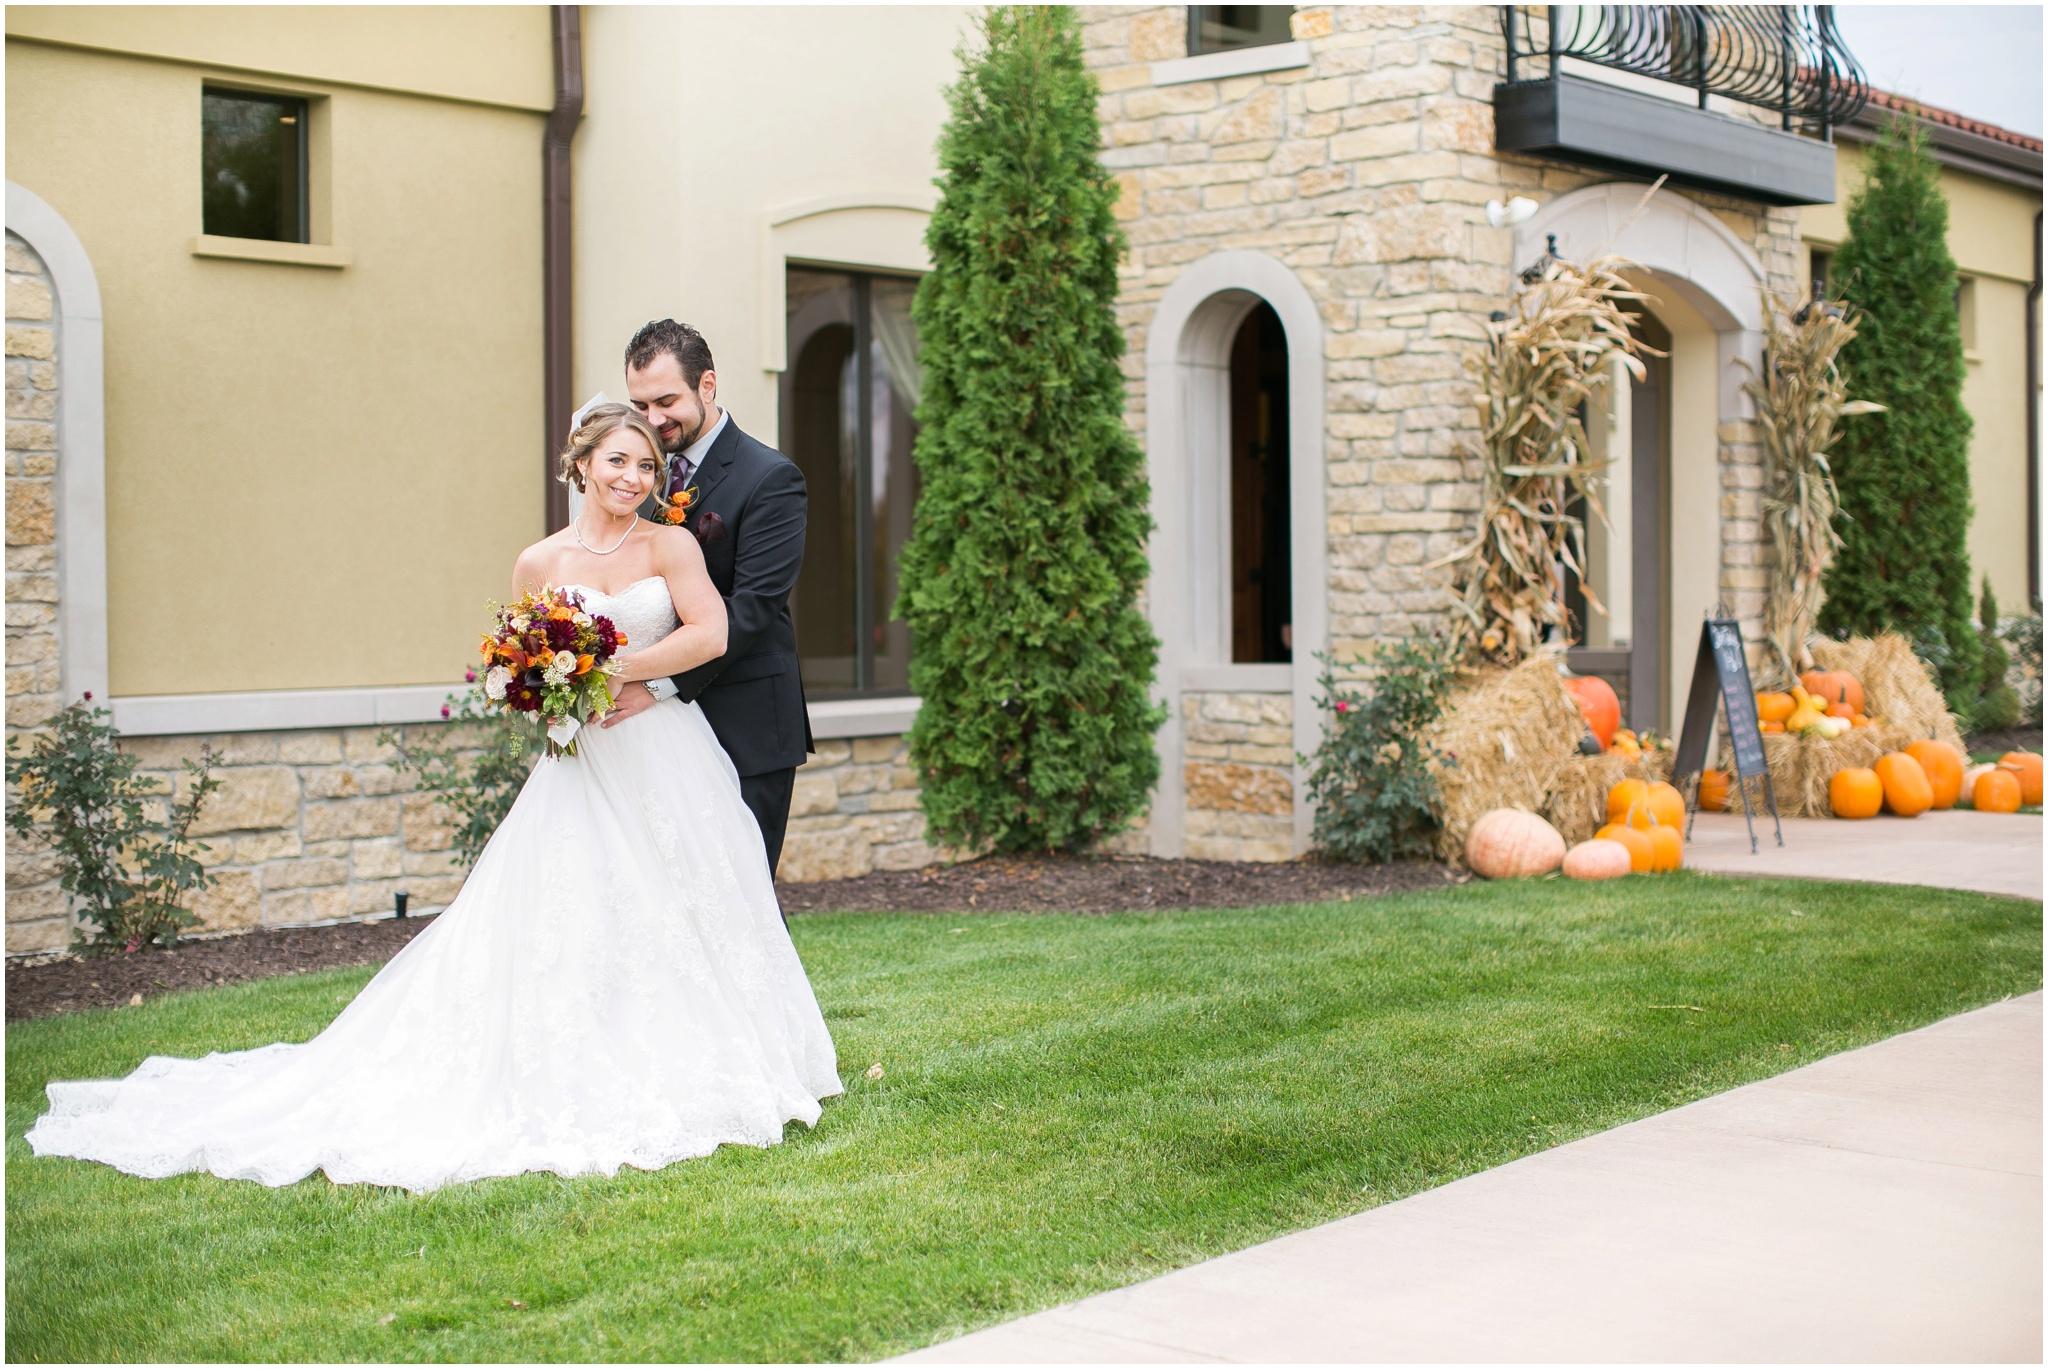 DC_Estate_Winery_Wedding_Beloit_Illinois_Wedding_0054.jpg